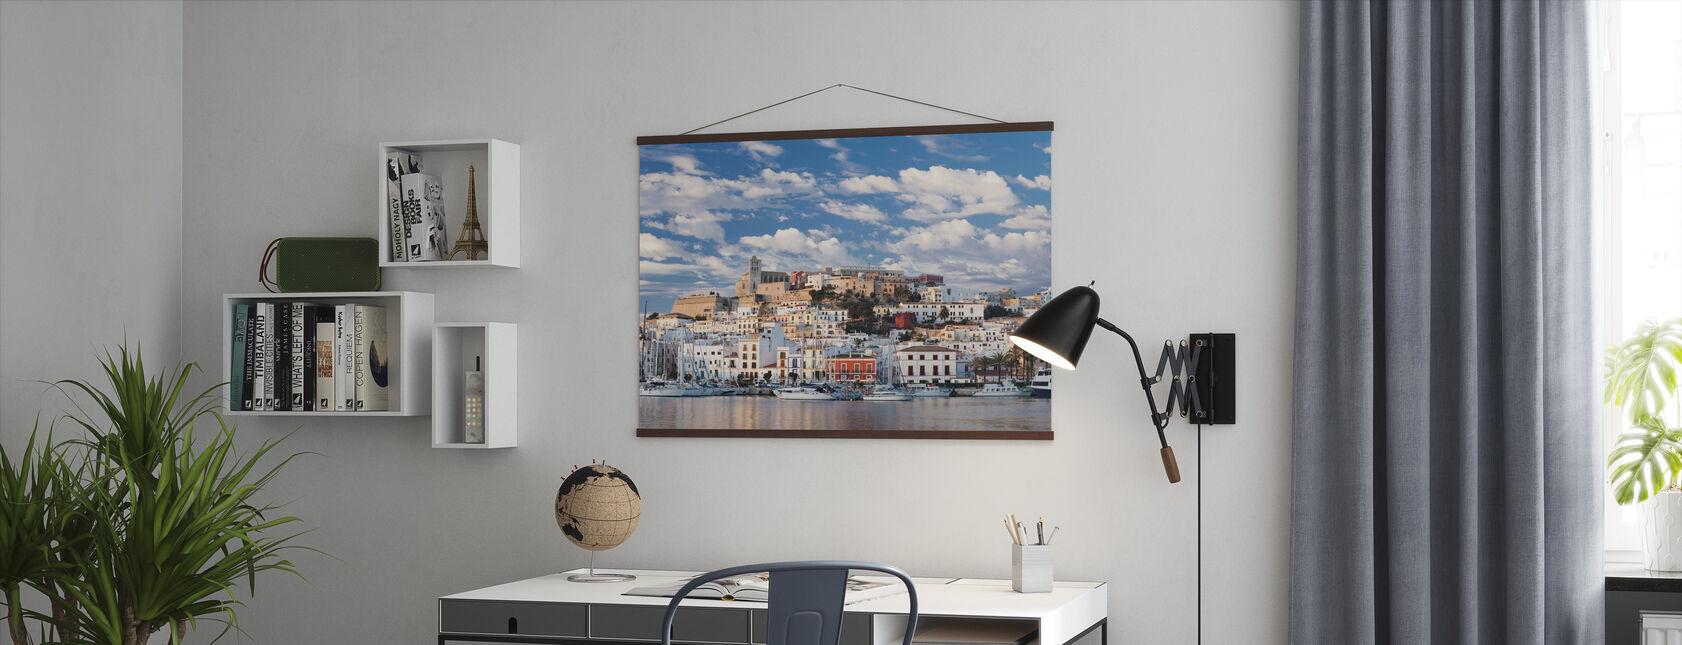 Ibiza-Stadt - Poster - Büro